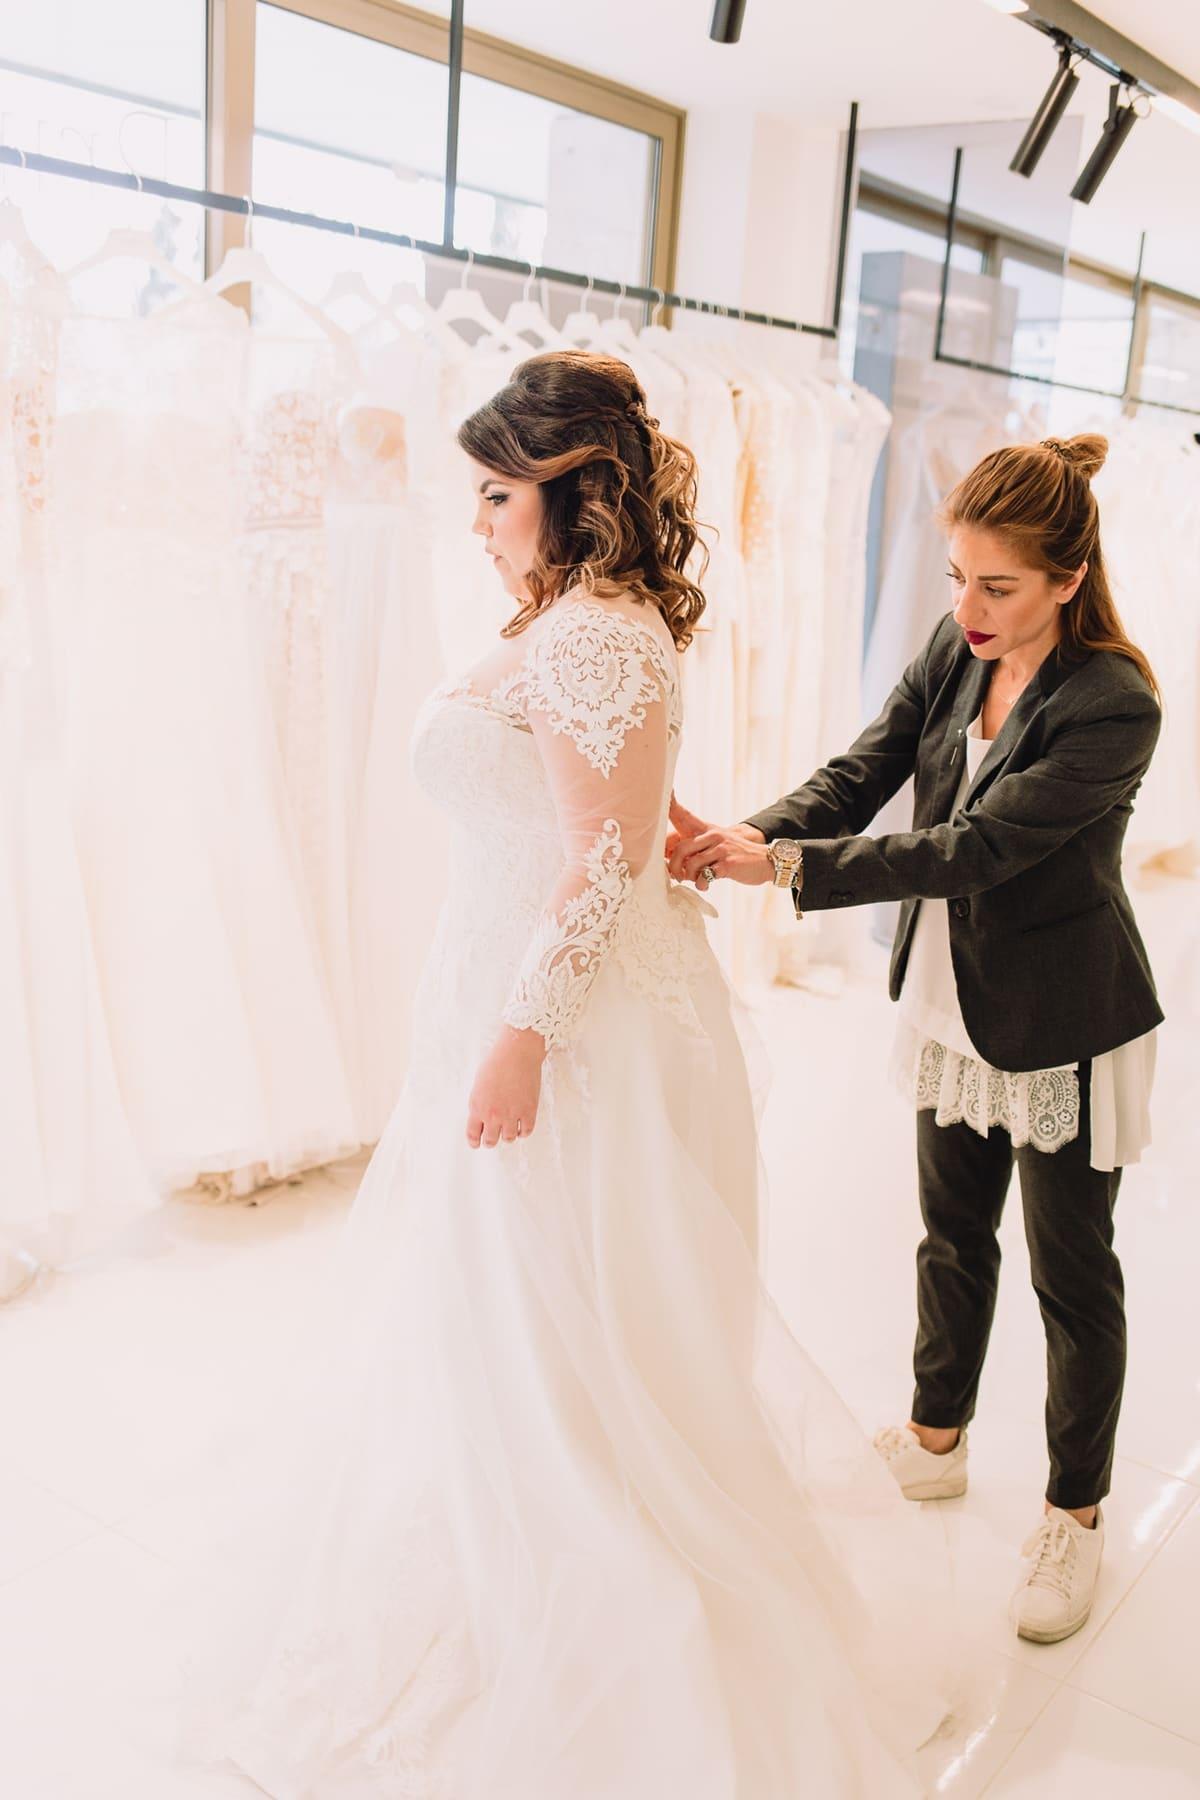 Wedding dress rehearsal